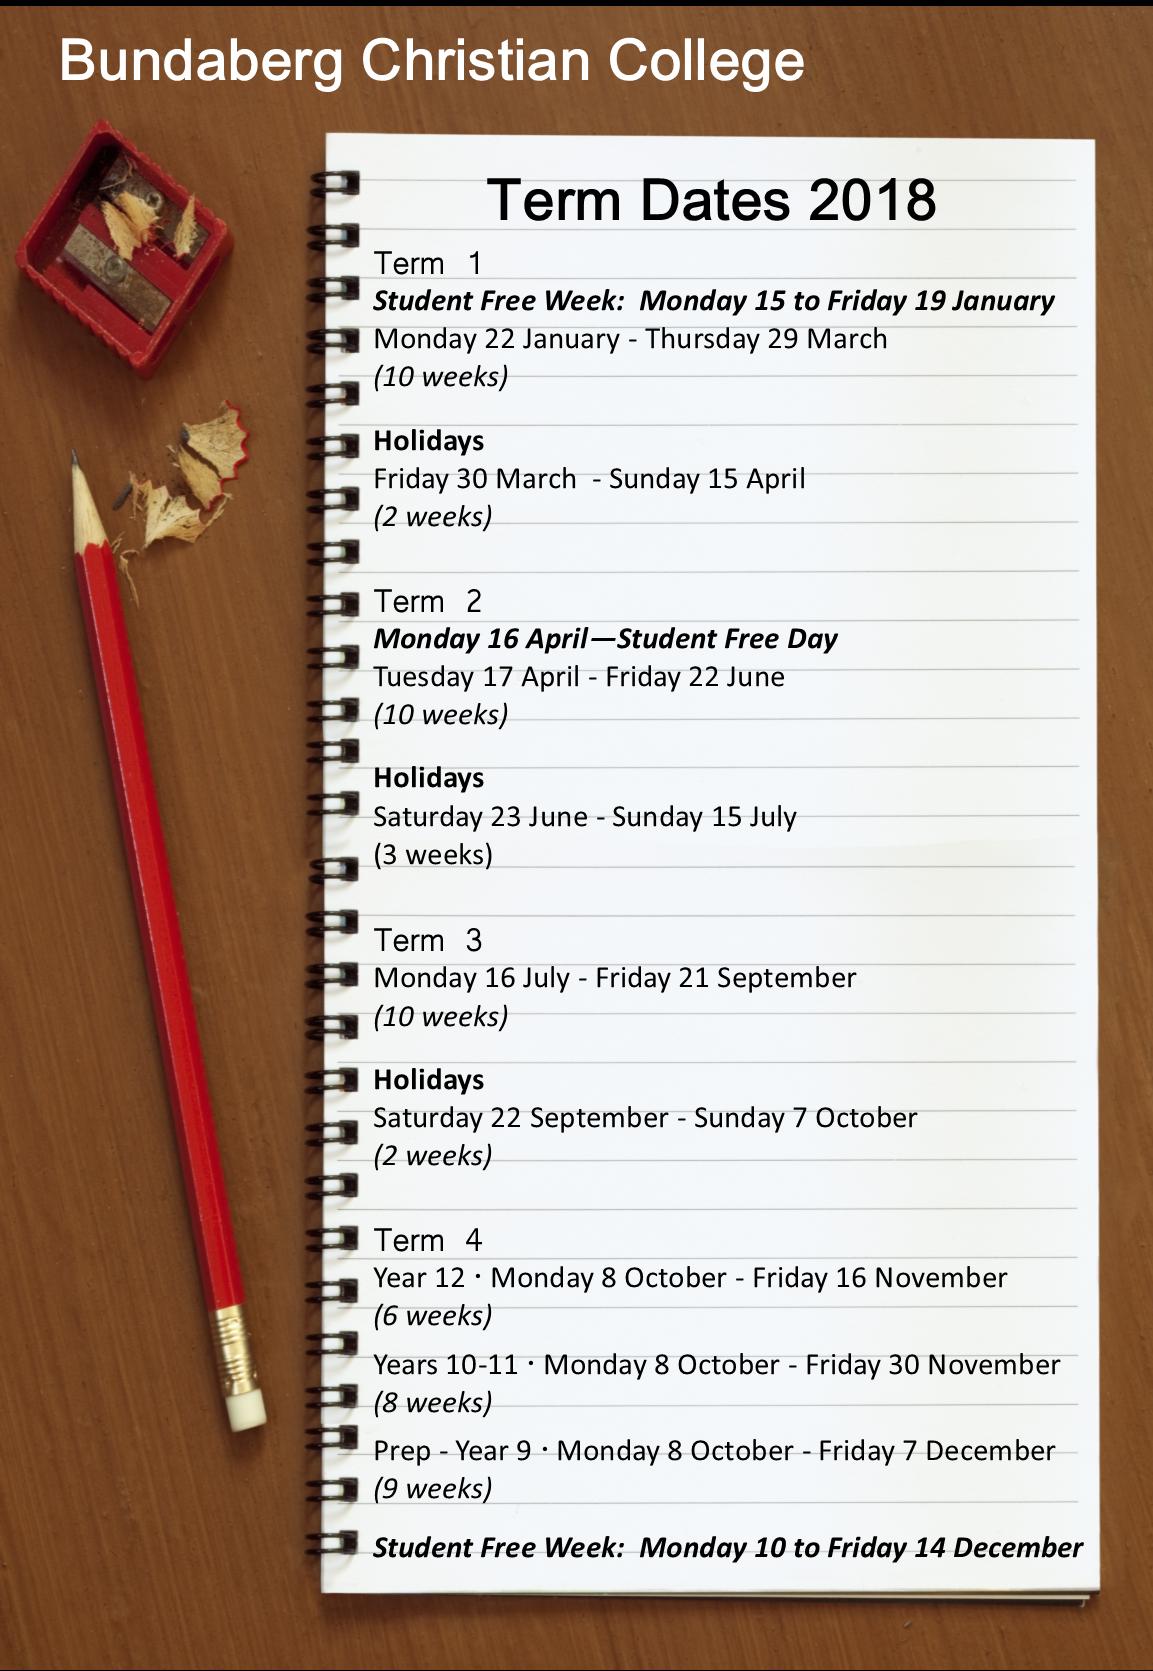 2018 Term Dates Image